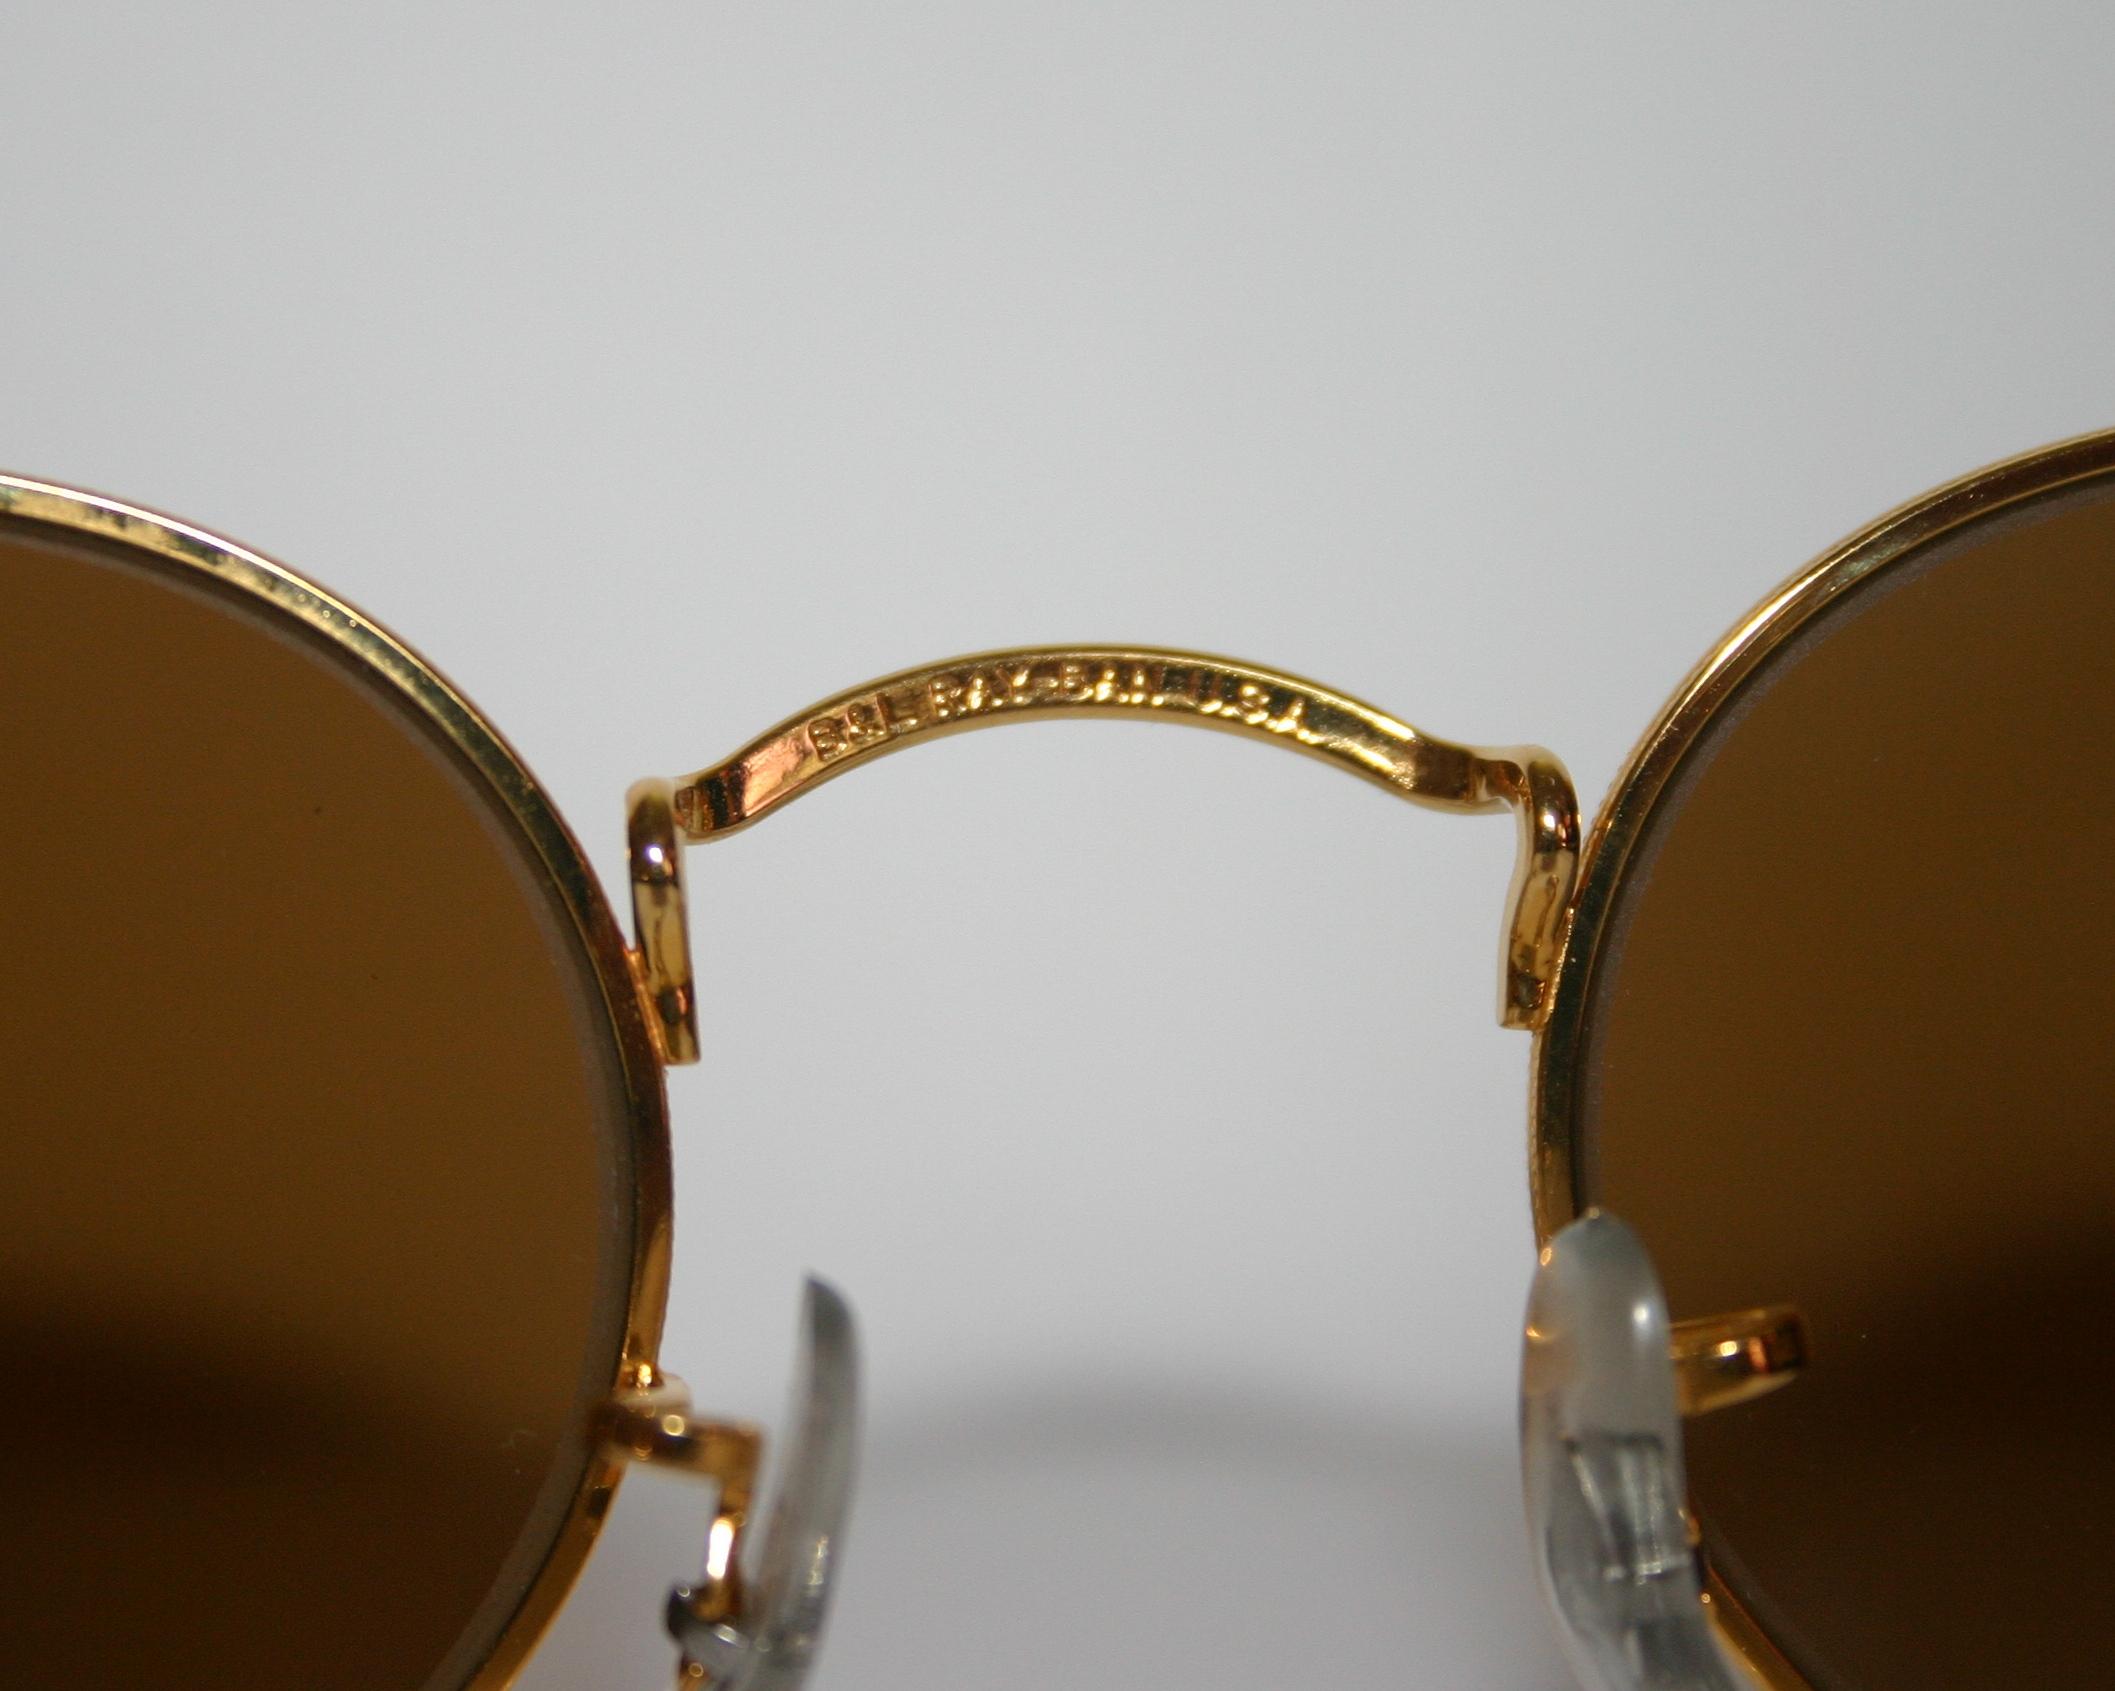 9b14de8037d9 Ray Ban Oval Sunglasses Ebay